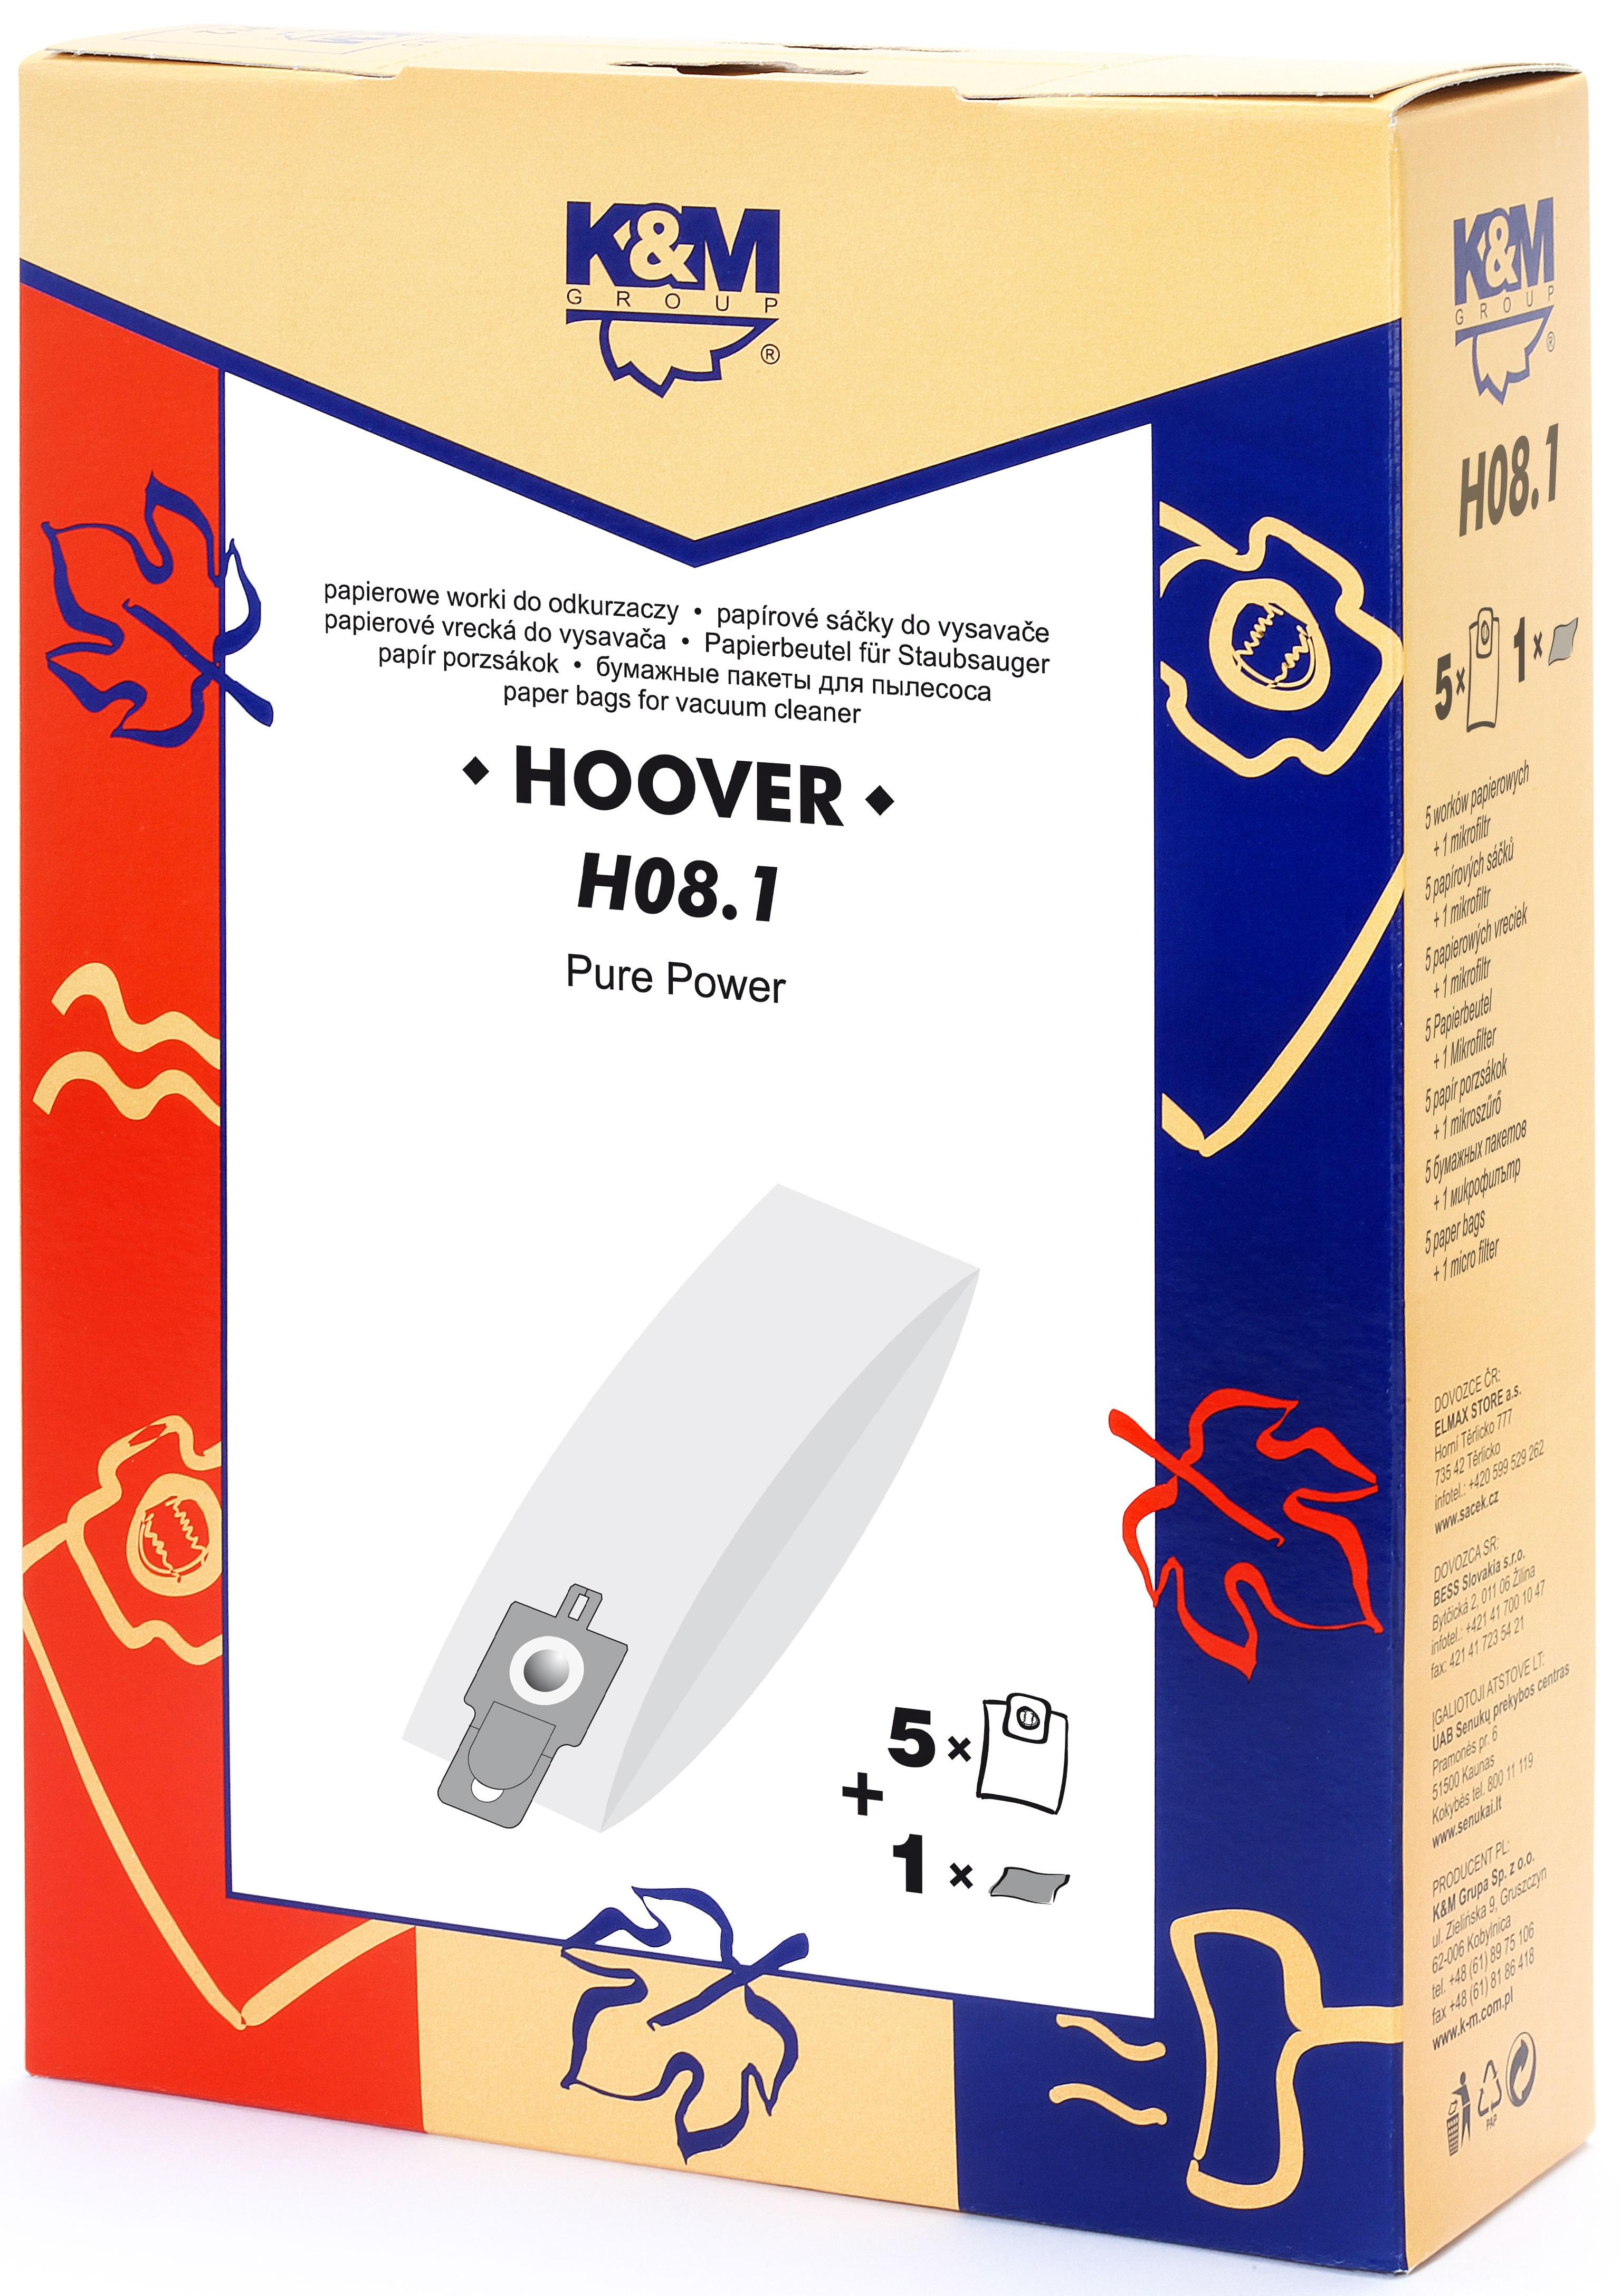 Sac aspirator Hoover H20, H20A, hartie, 5X saci, K&M 0